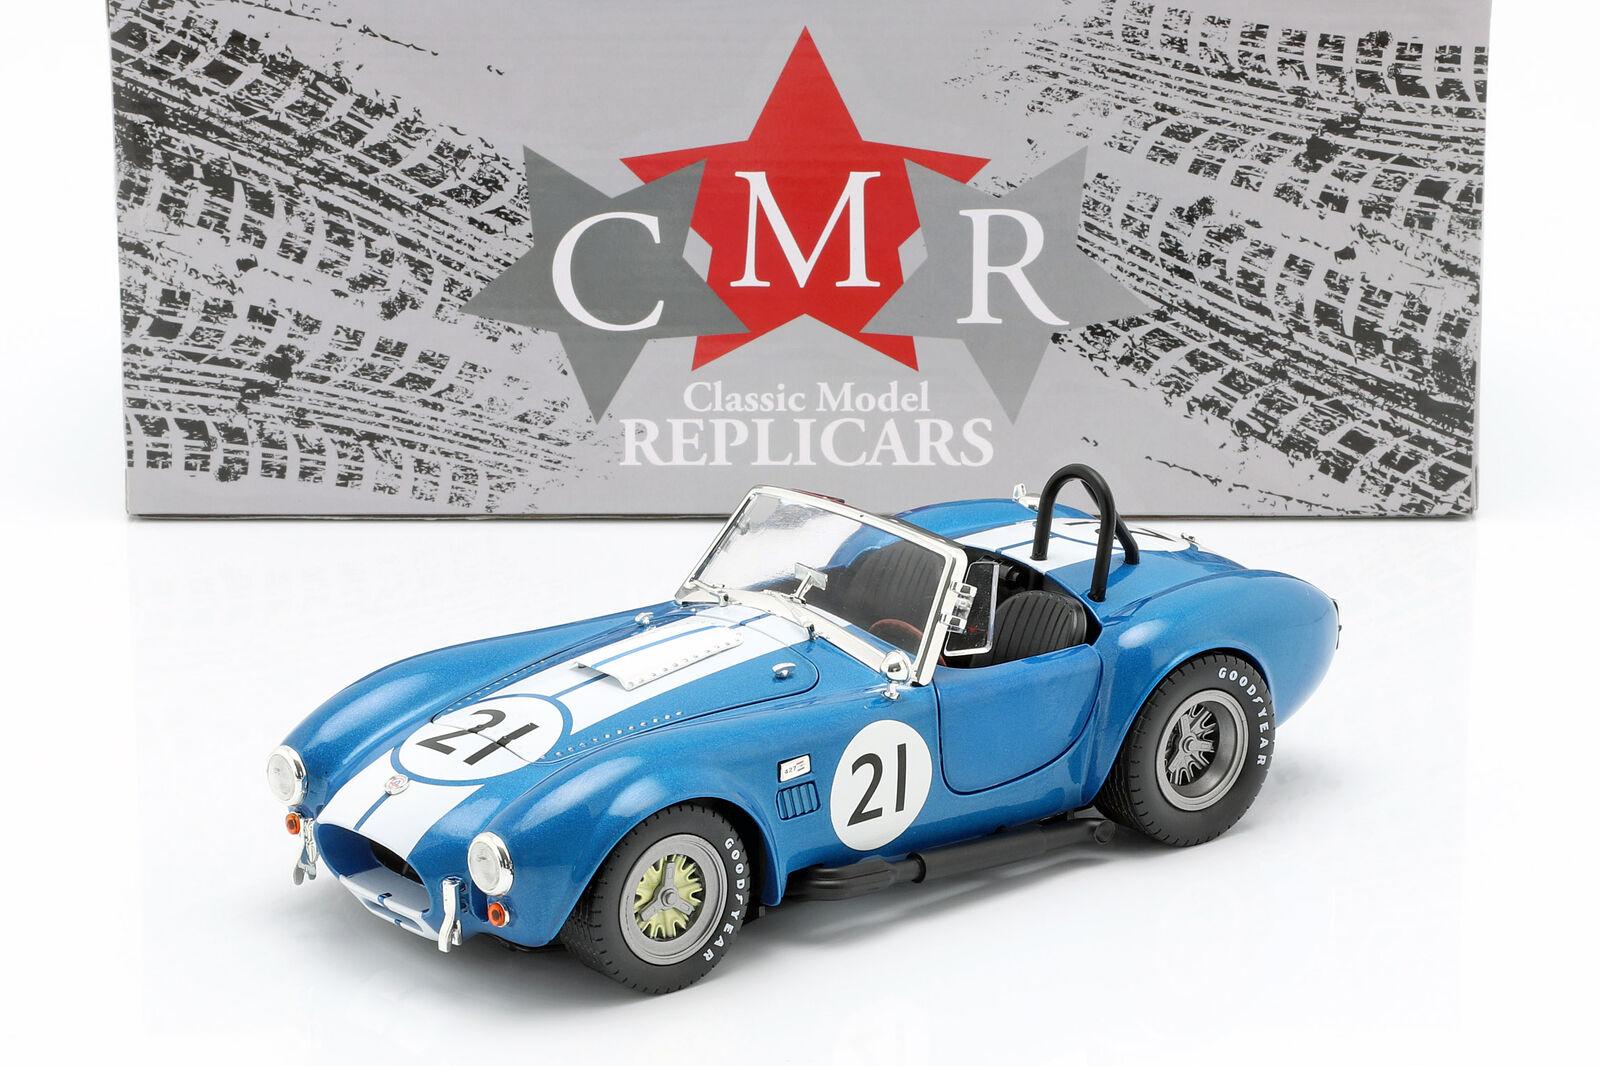 CMR 1/18 シェルビー コブラ 427 レーシング #21 ブルー ホワイト Shelby Cobra 427 Racing #21 blue / white